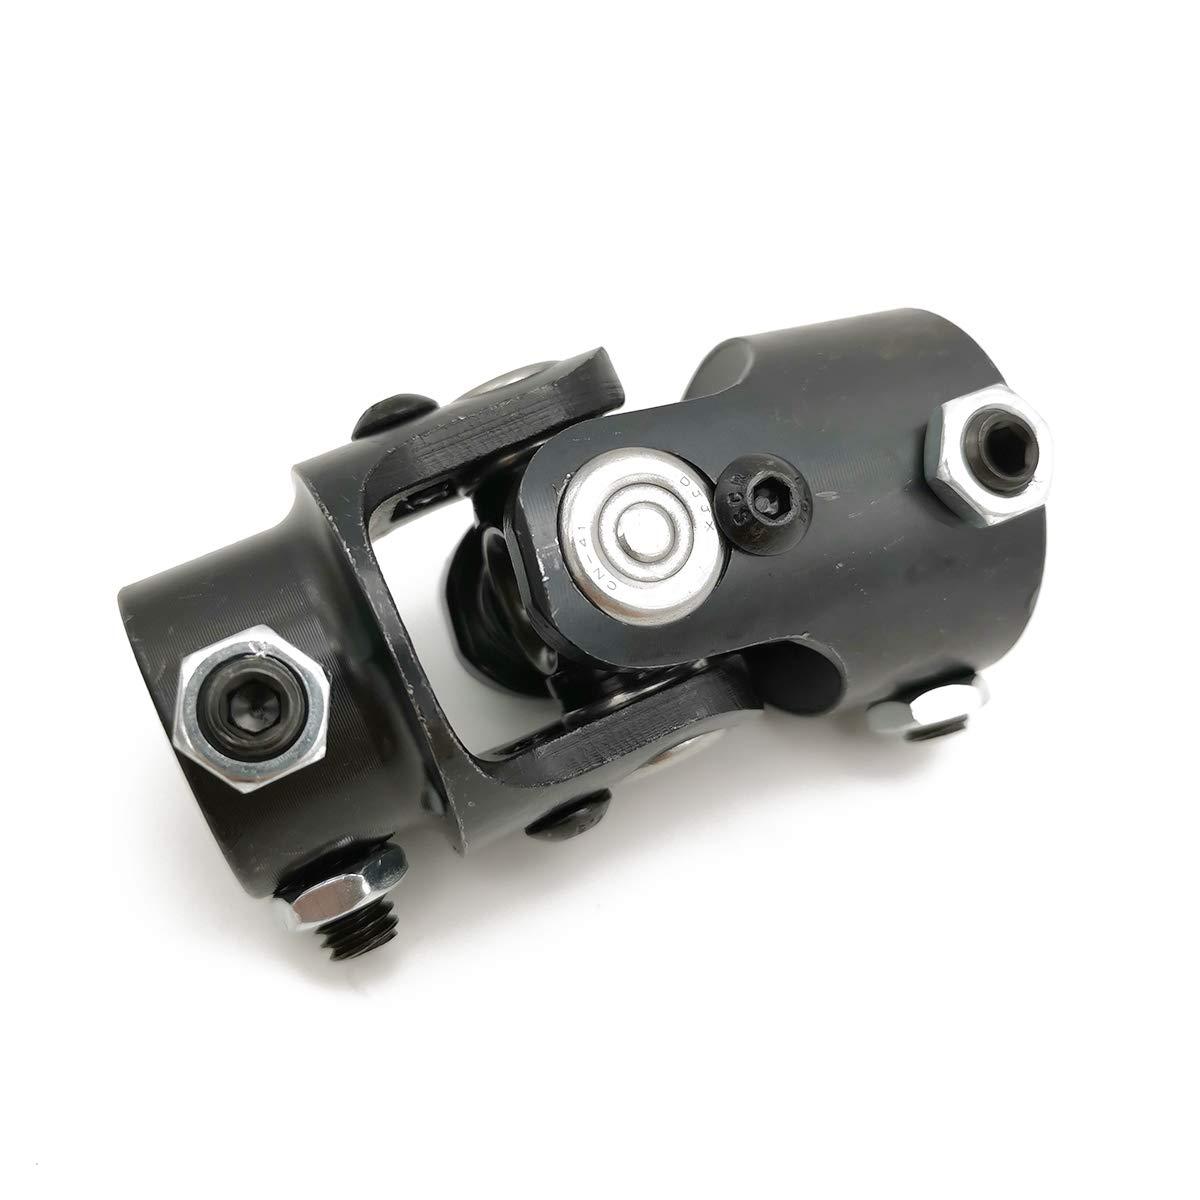 Ensun 3/4 DD x 1 DD Black Single Steering Shaft Universal U Joint, Maximum Working Angle: 35° Degree, Total Length: 83mm (3-1/4'')